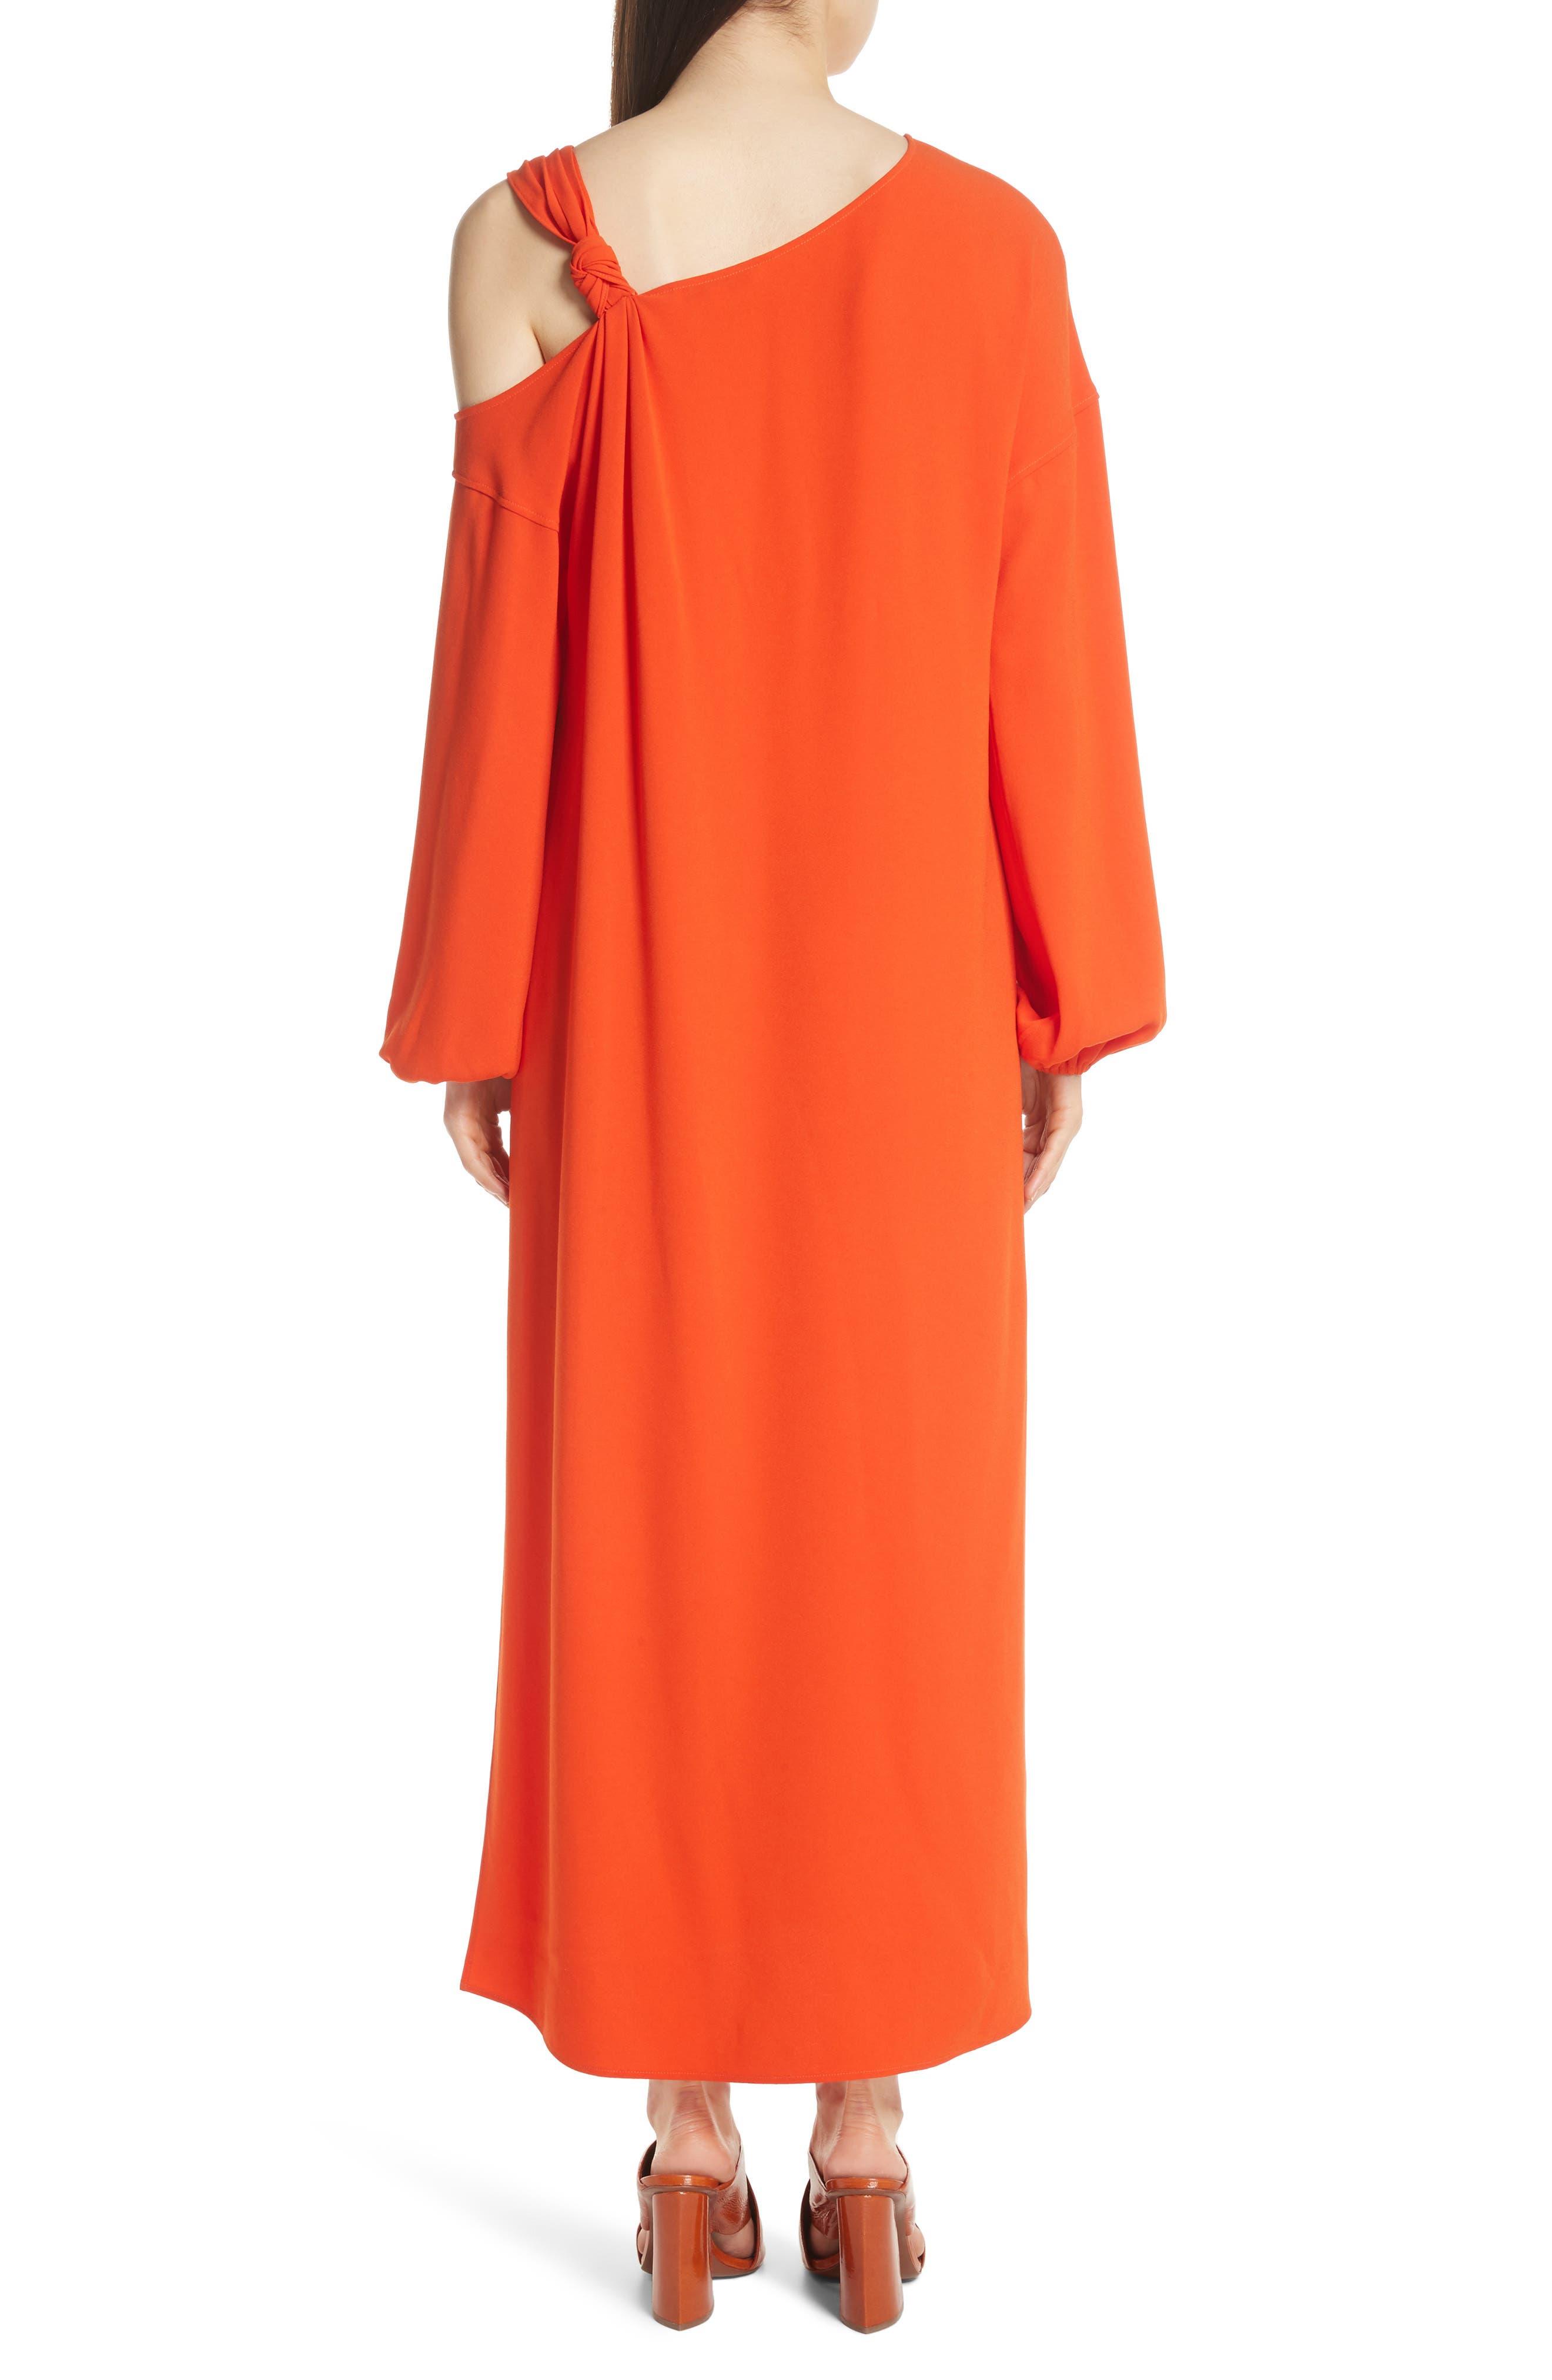 ELIZABETH AND JAMES,                             Shontae One-Shoulder Maxi Dress,                             Alternate thumbnail 2, color,                             807